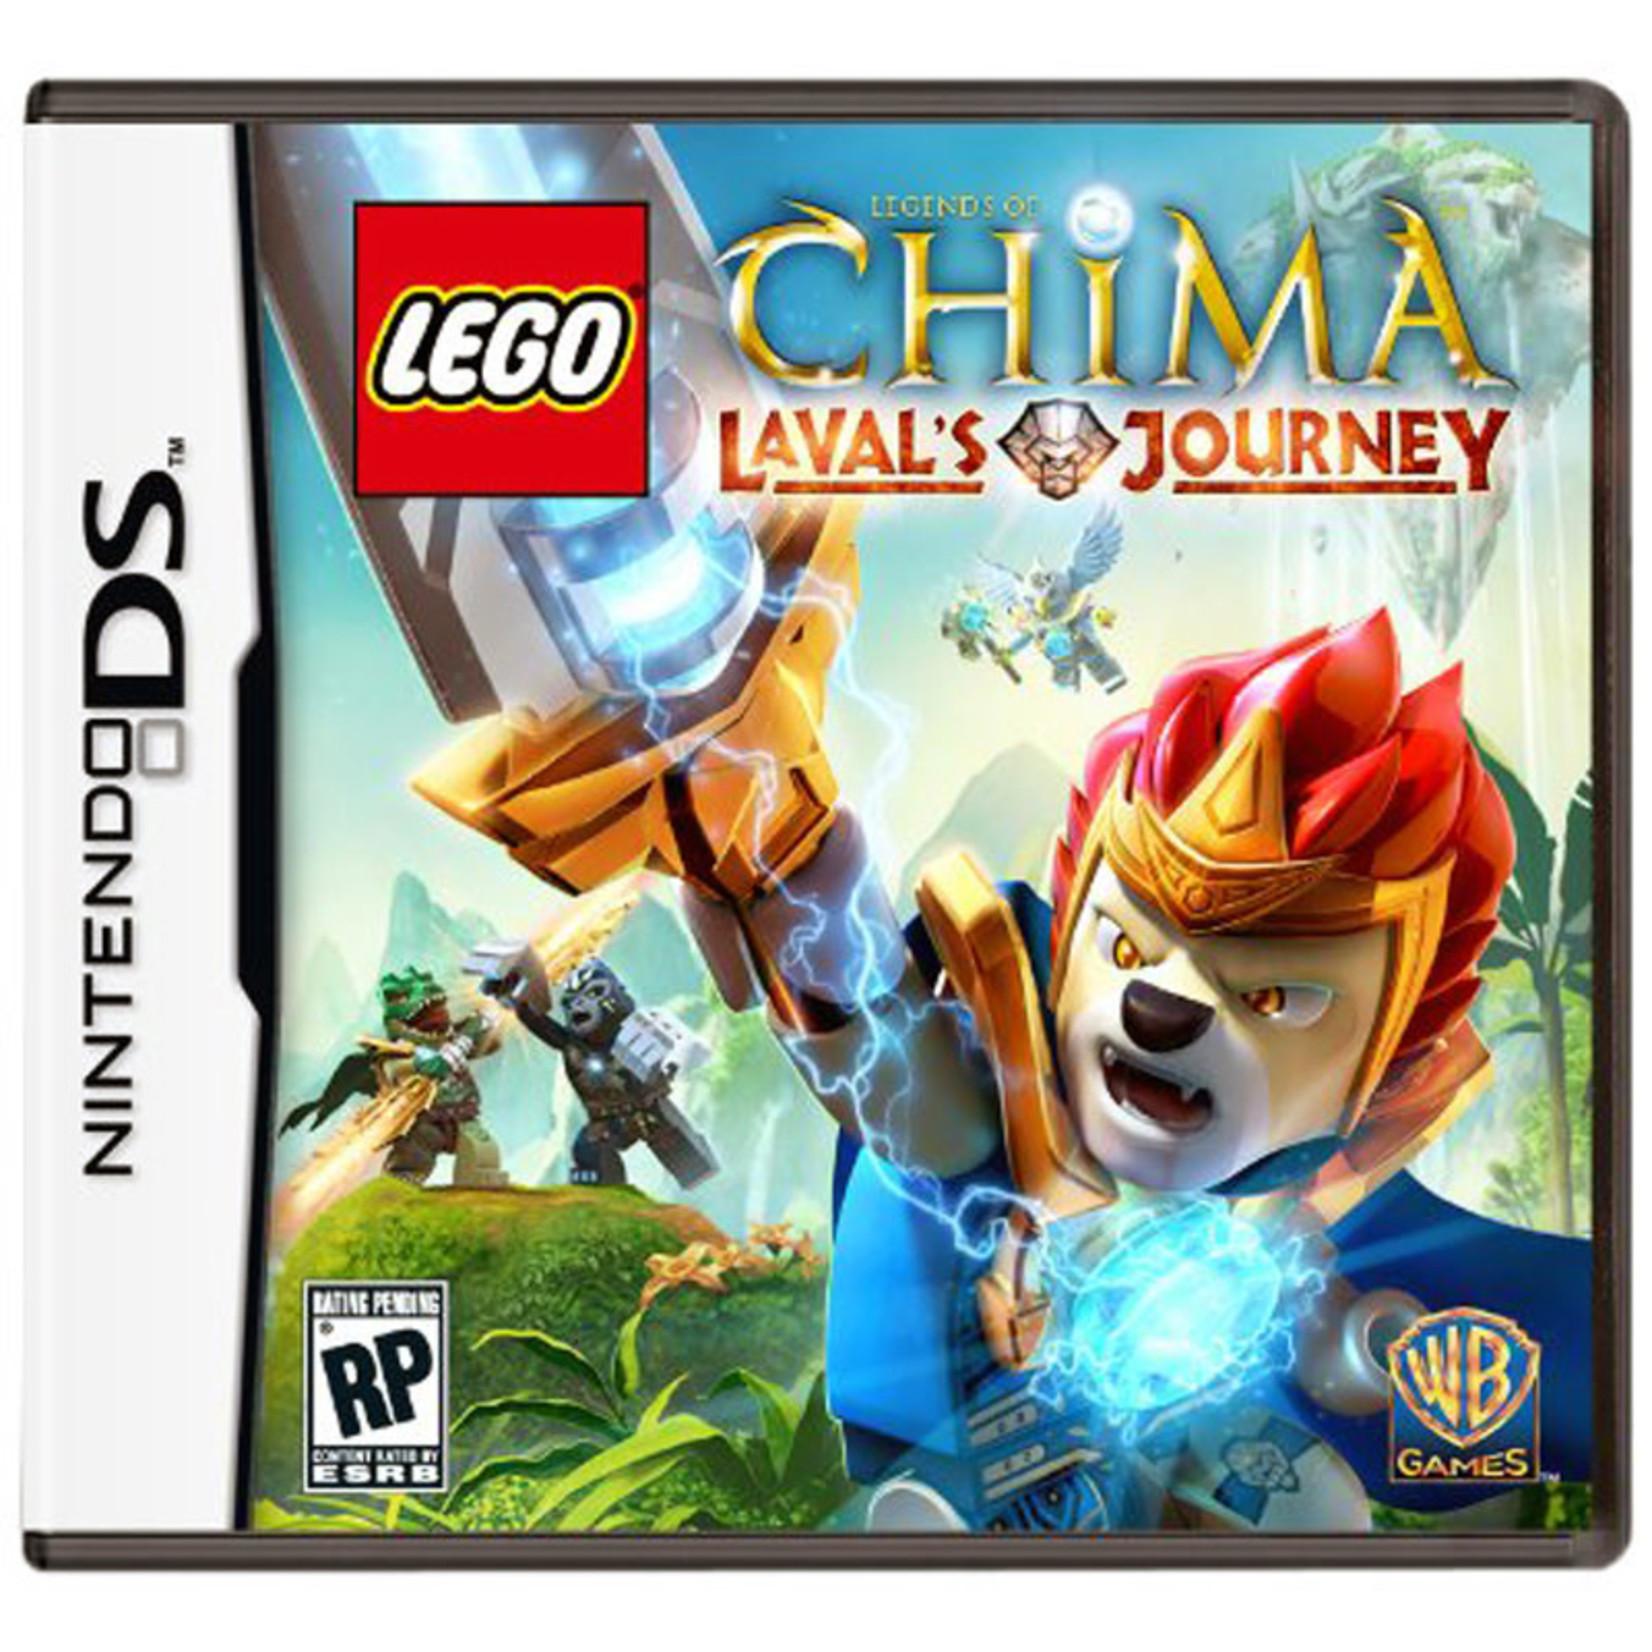 DSU-LEGO LEGENDS OF CHIMA: LAVAL'S JOURNEY